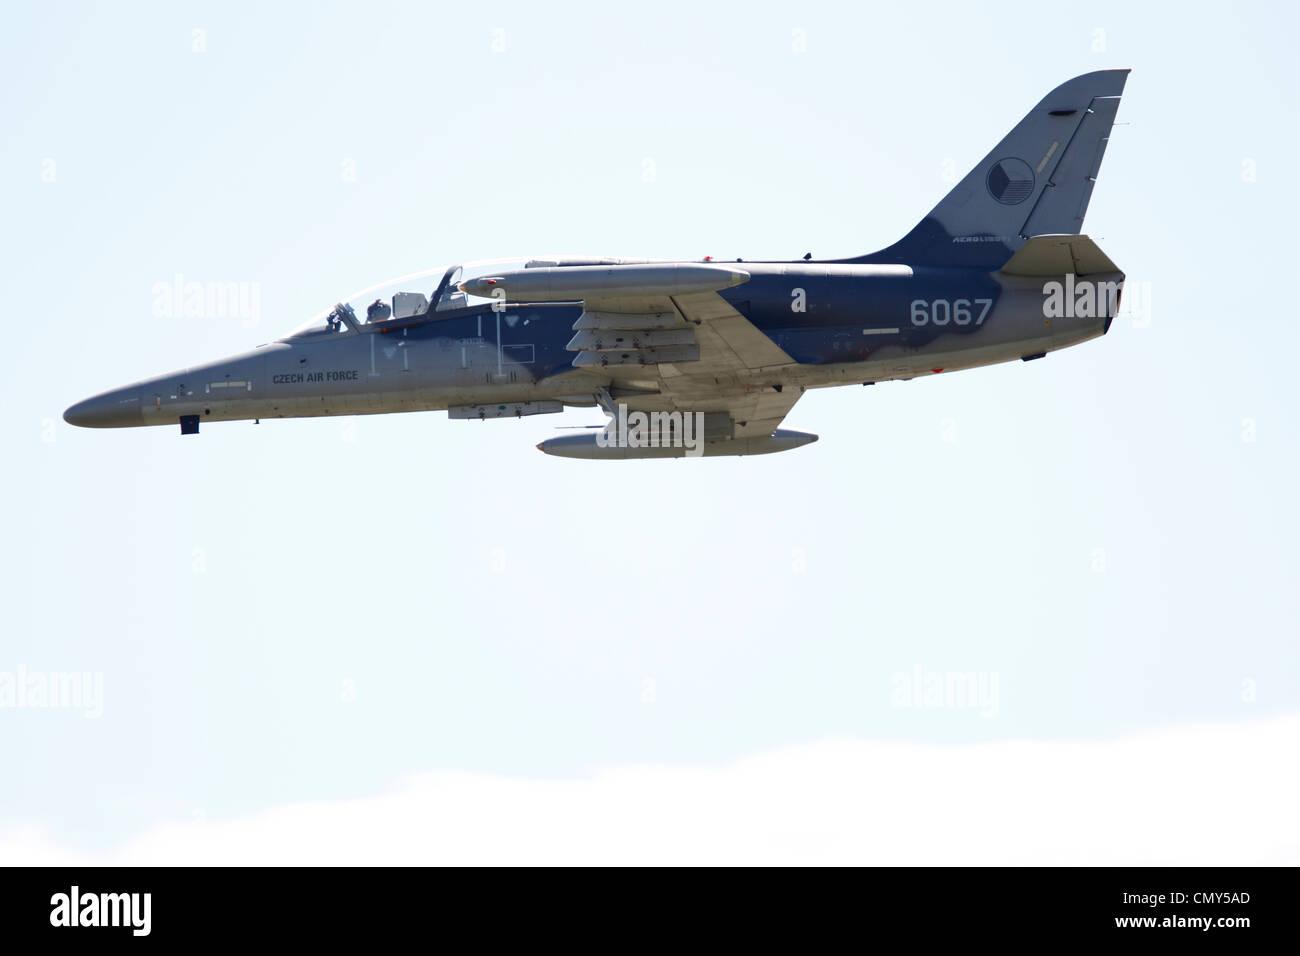 Czech Air Force L-159T1 6067 Aero L 159 ALCA Military Advanced Light Combat Aircraft. Czech-built multi-role combat - Stock Image